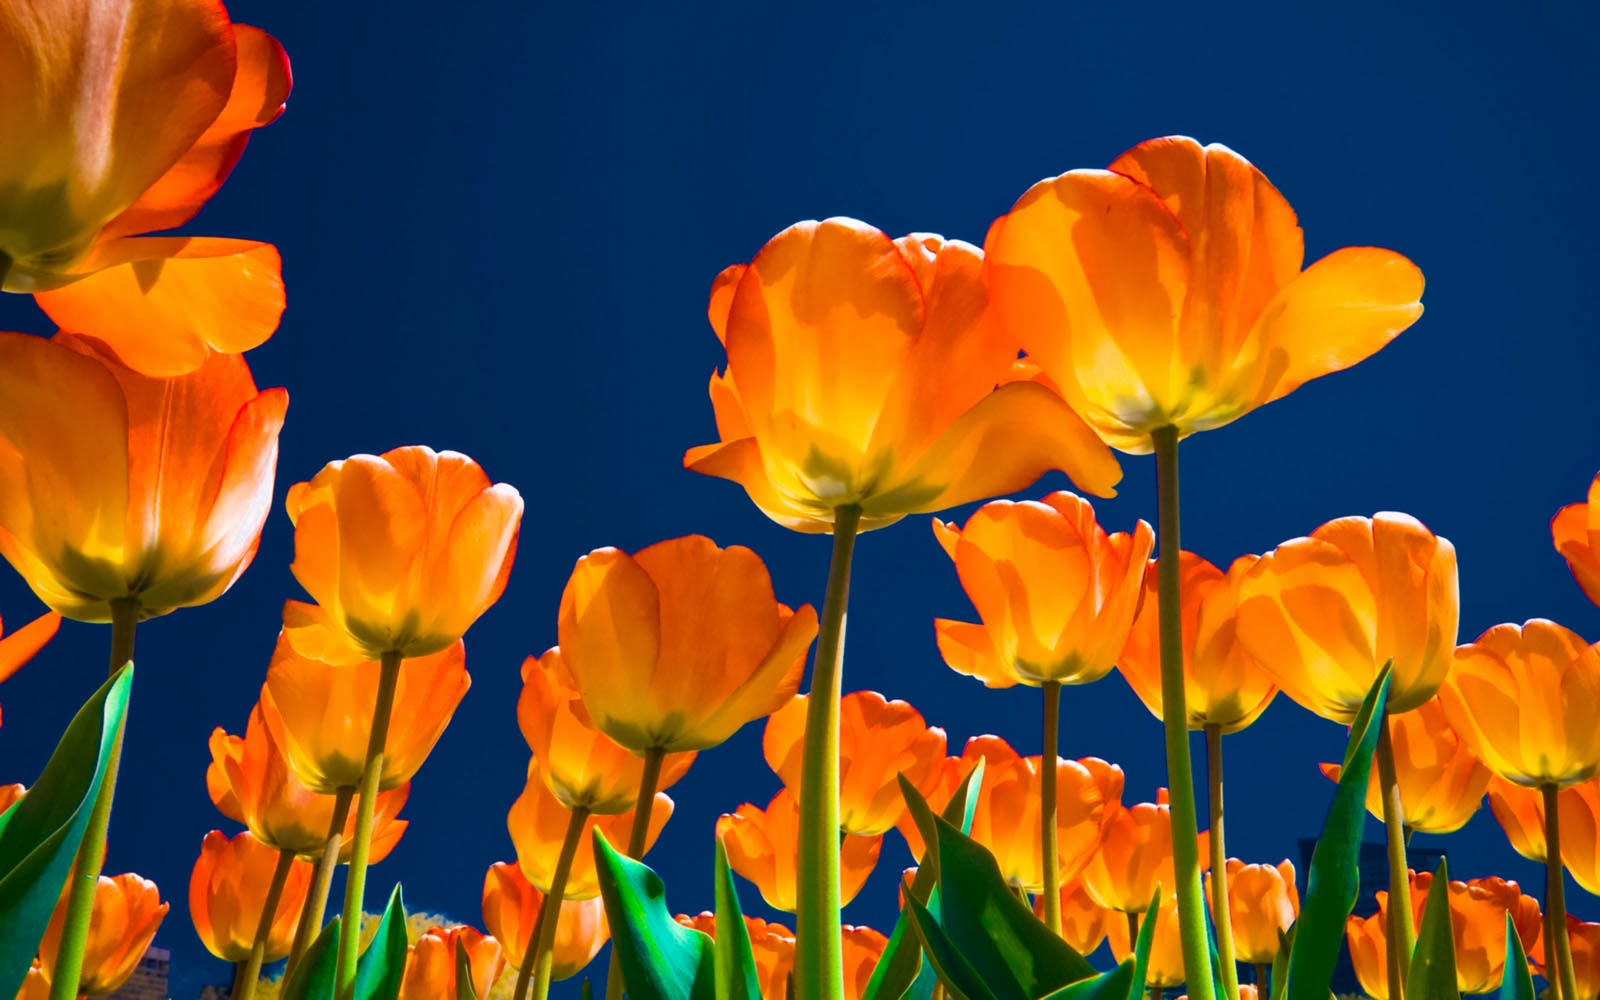 Clovisso Wallpaper Gallery Tulips Wallpapers